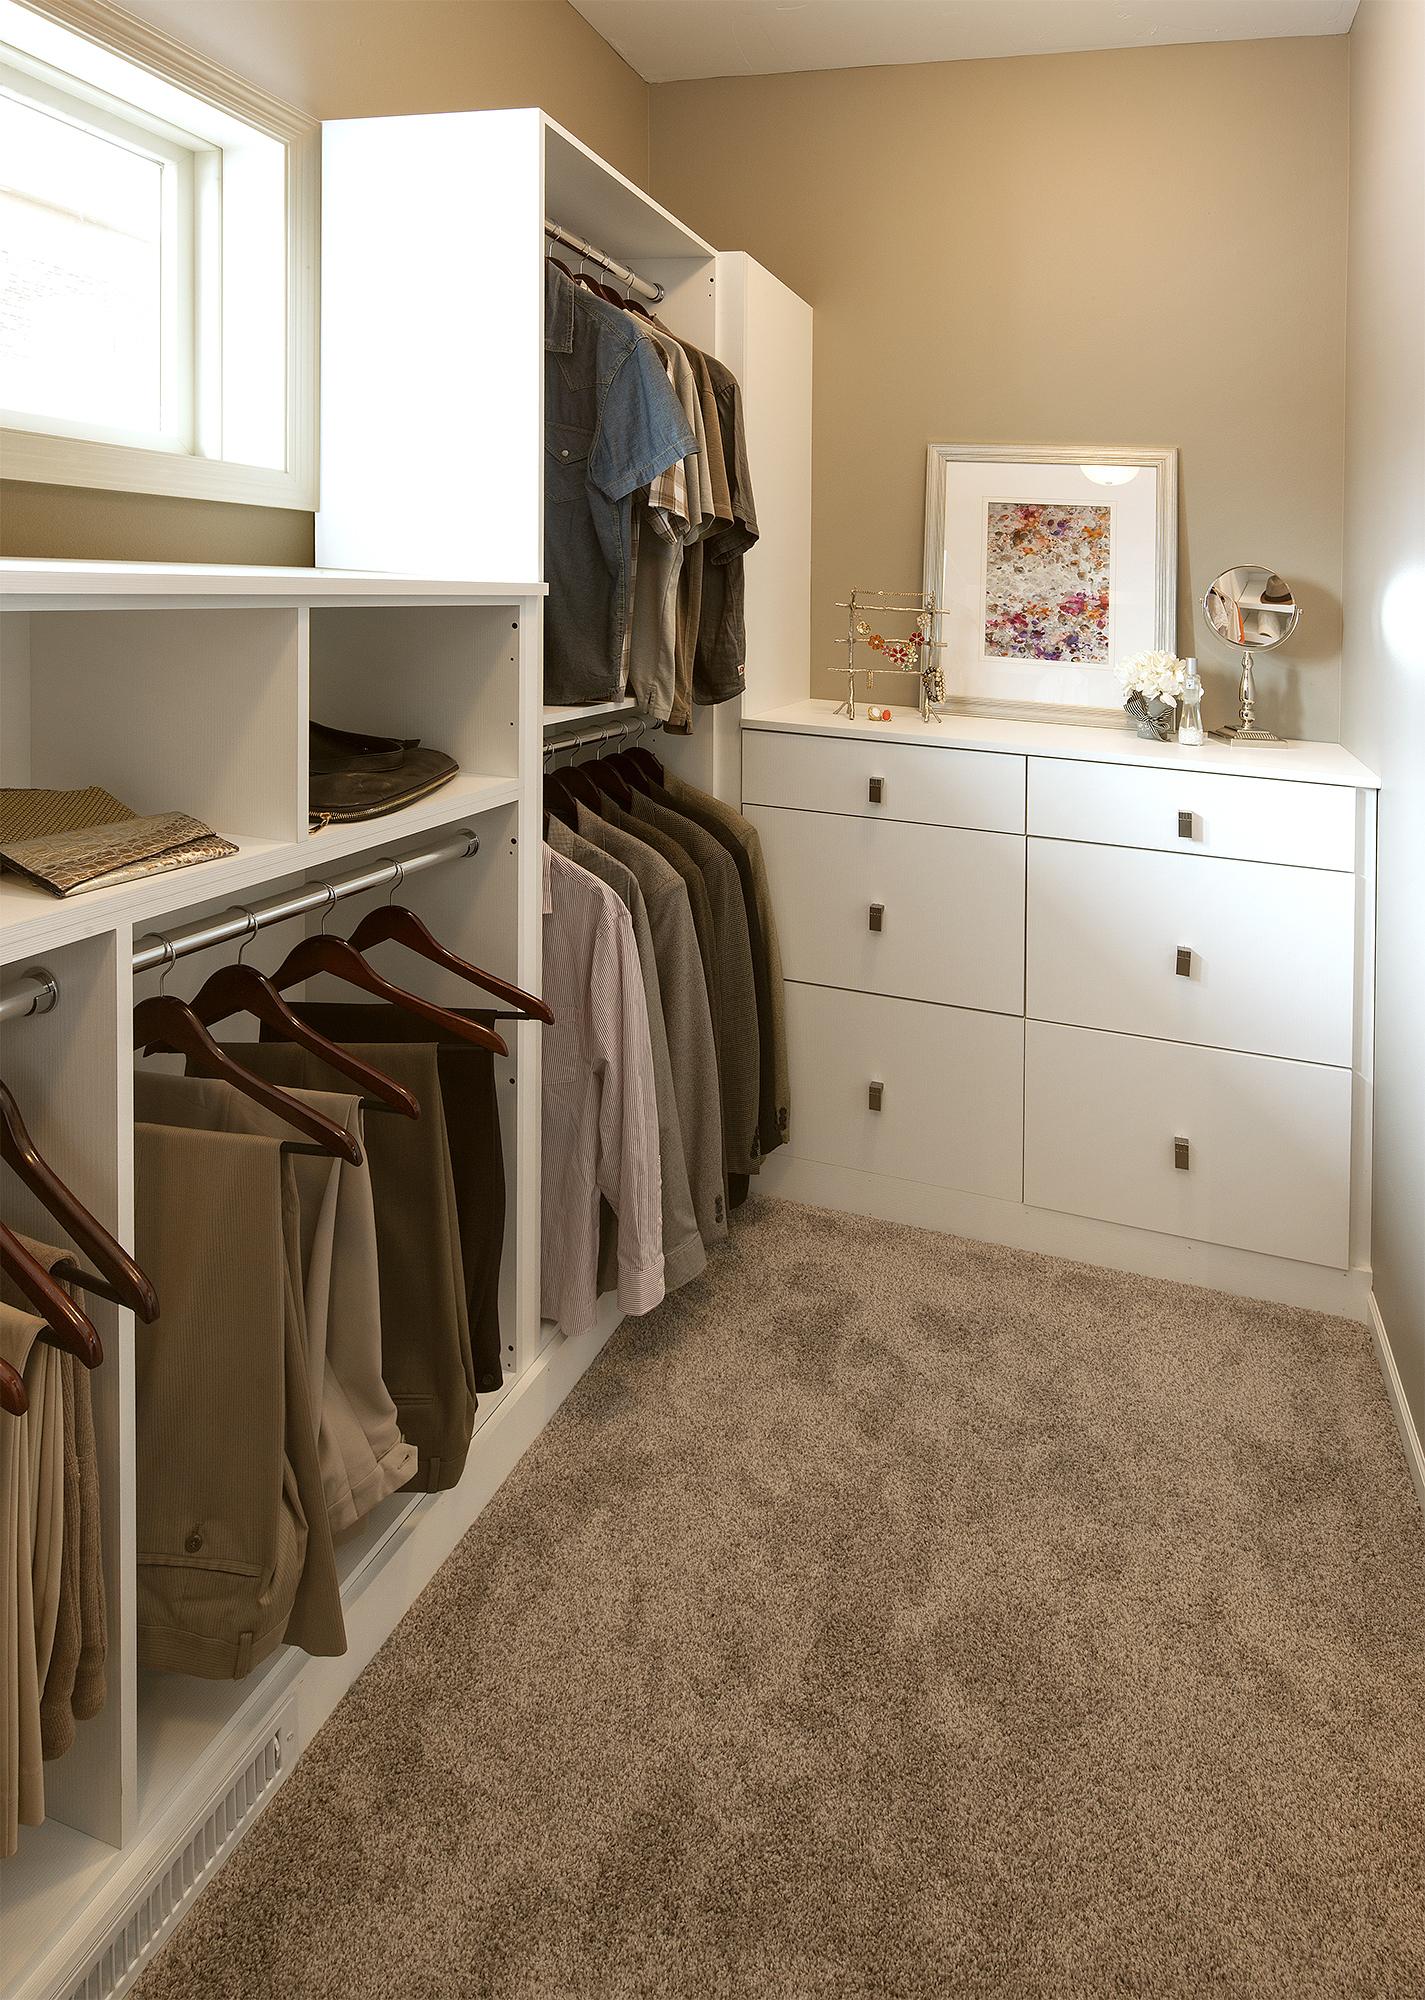 Slab Style closet cabinets in Glacier White textured melamine by ShowplaceEVO - view 1